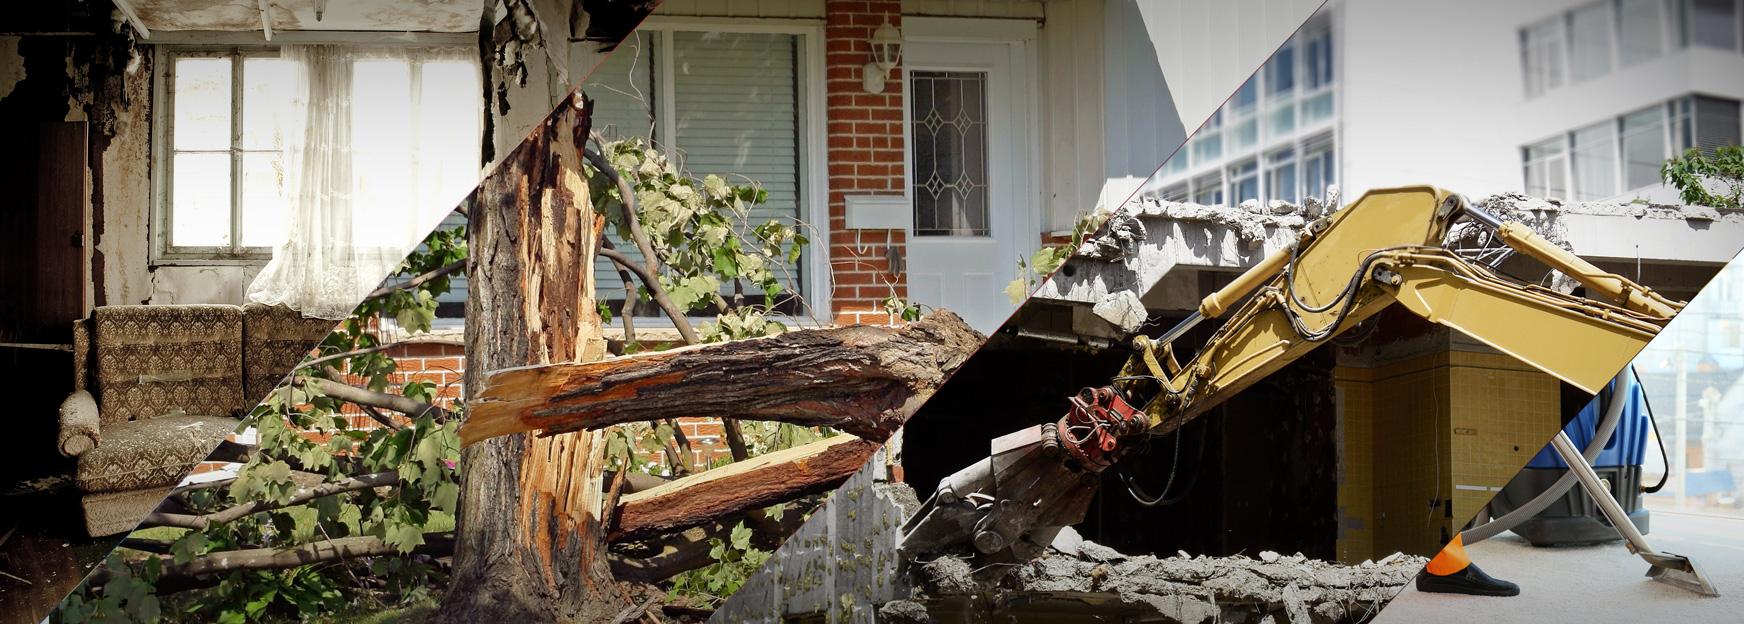 Demolition Restoration And Loss Limitation In Pensacola